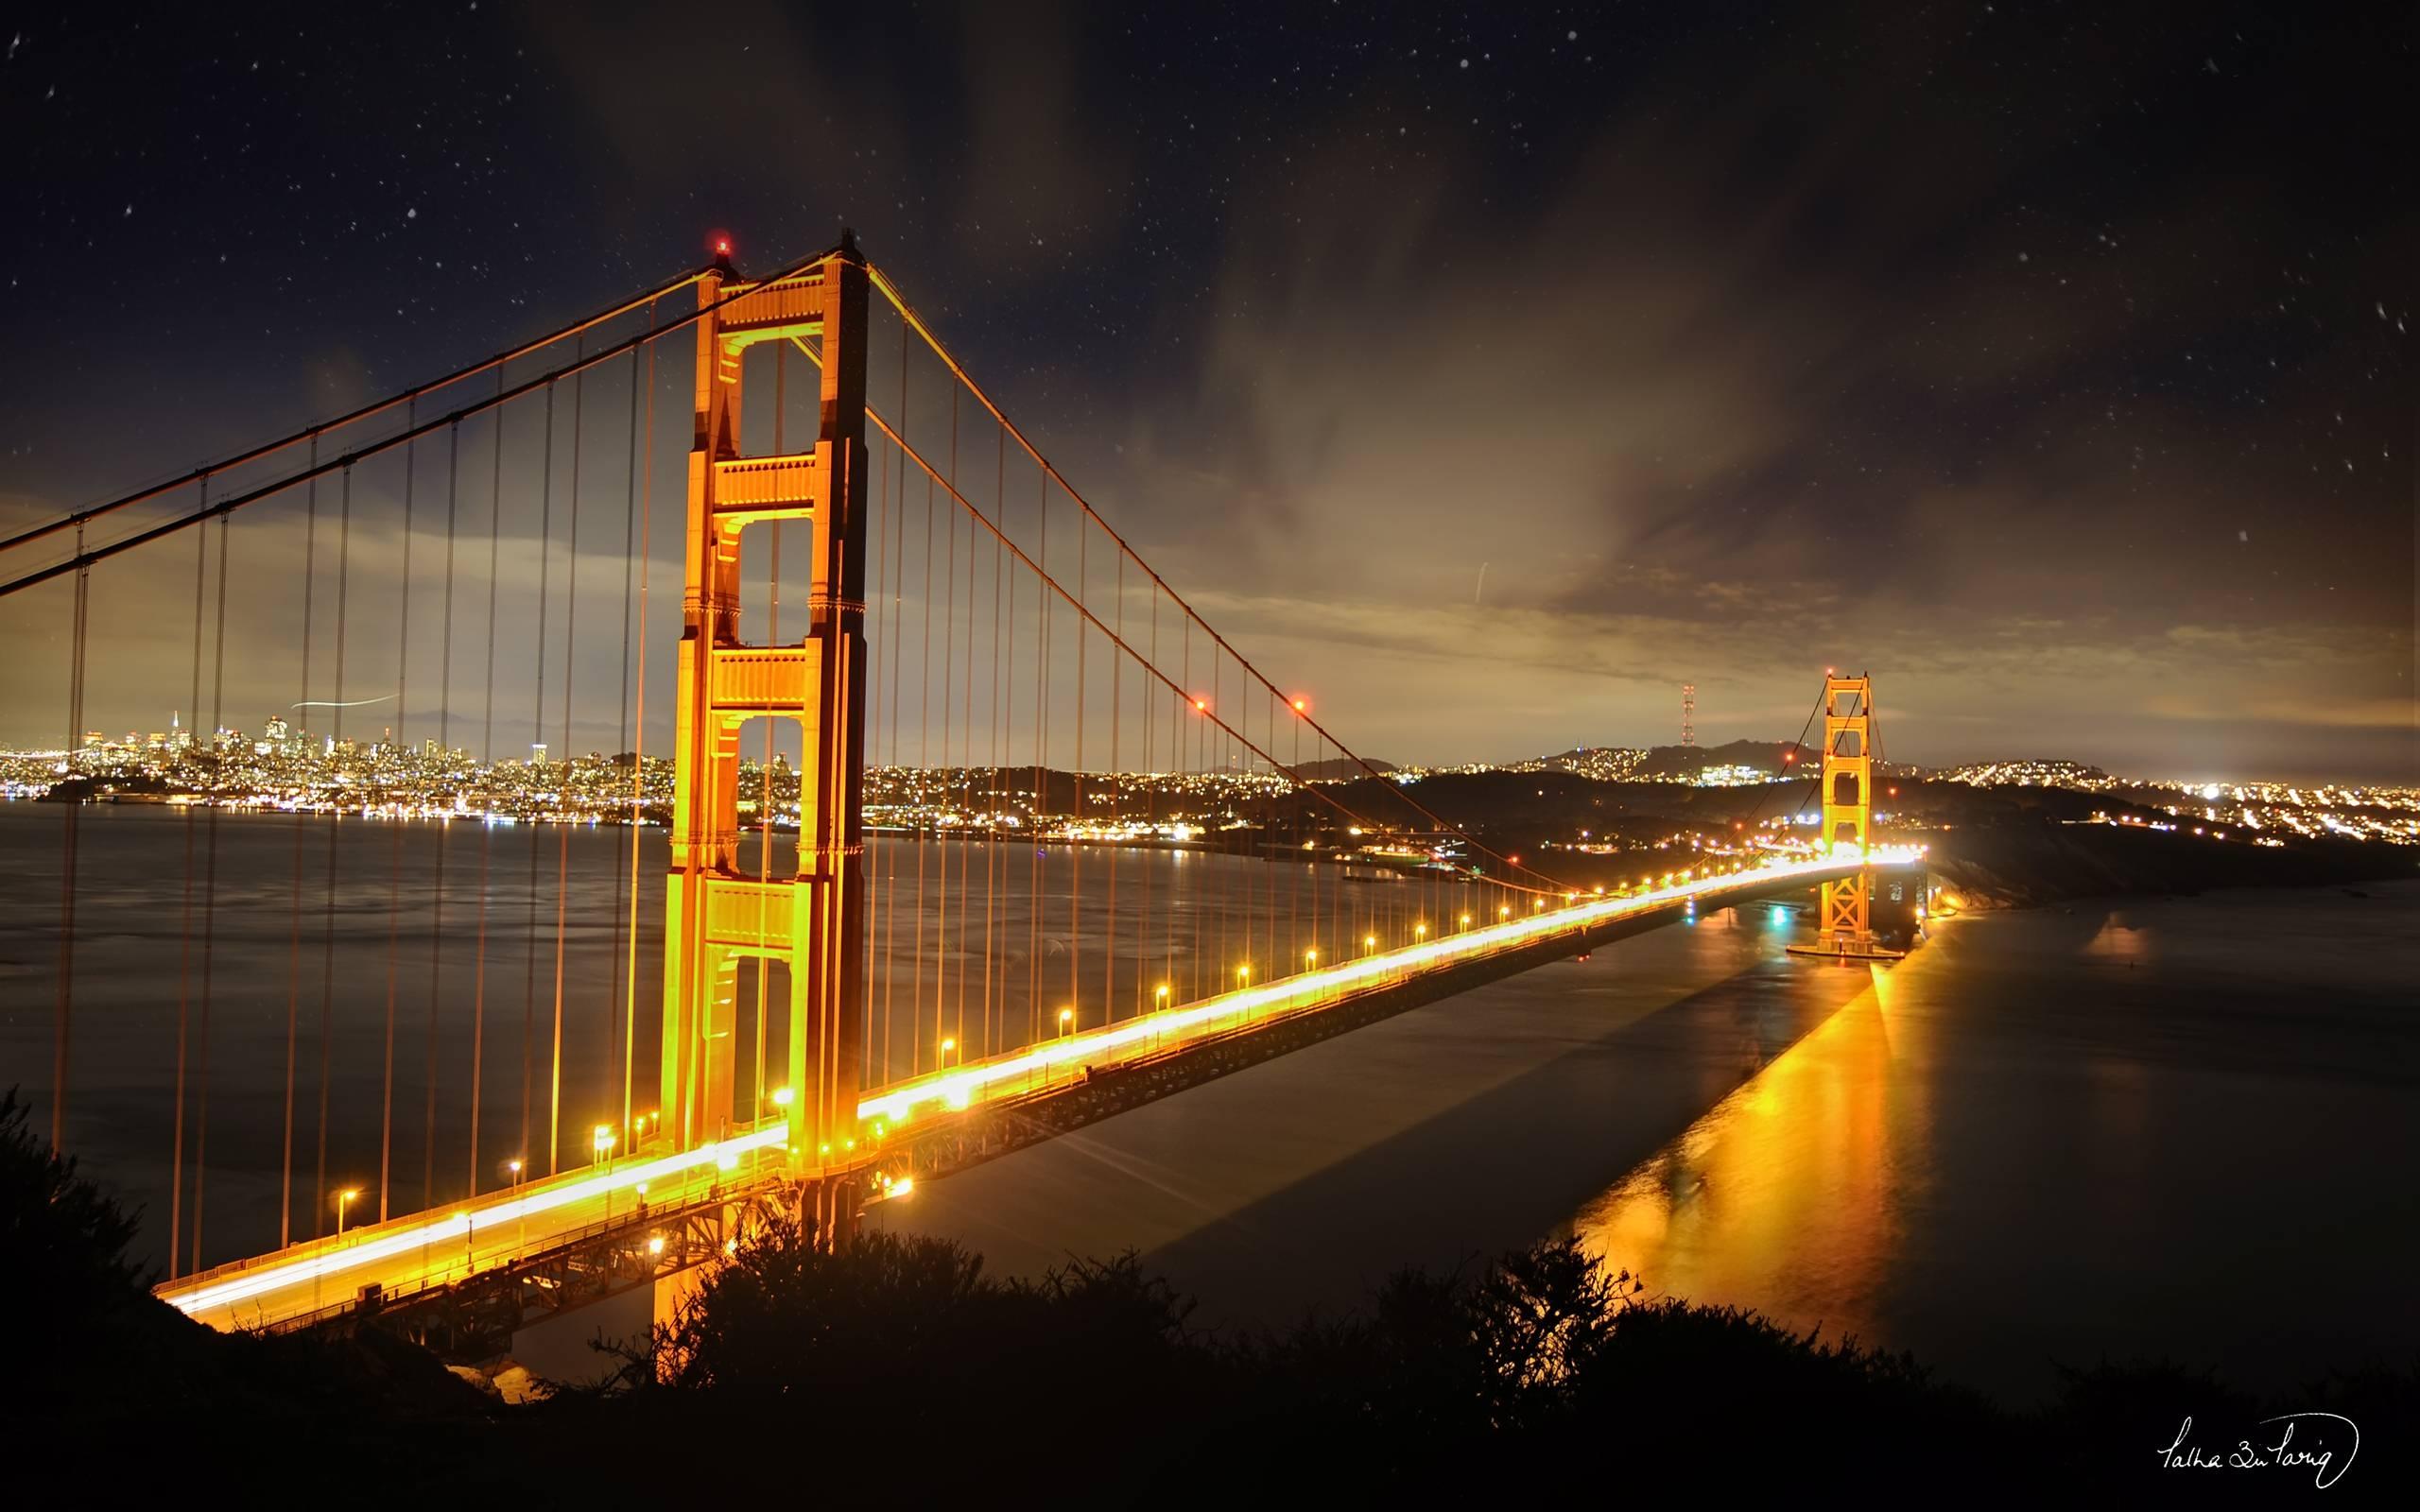 Golden Gate Bridge Night Wallpaper Full HD Mekamak